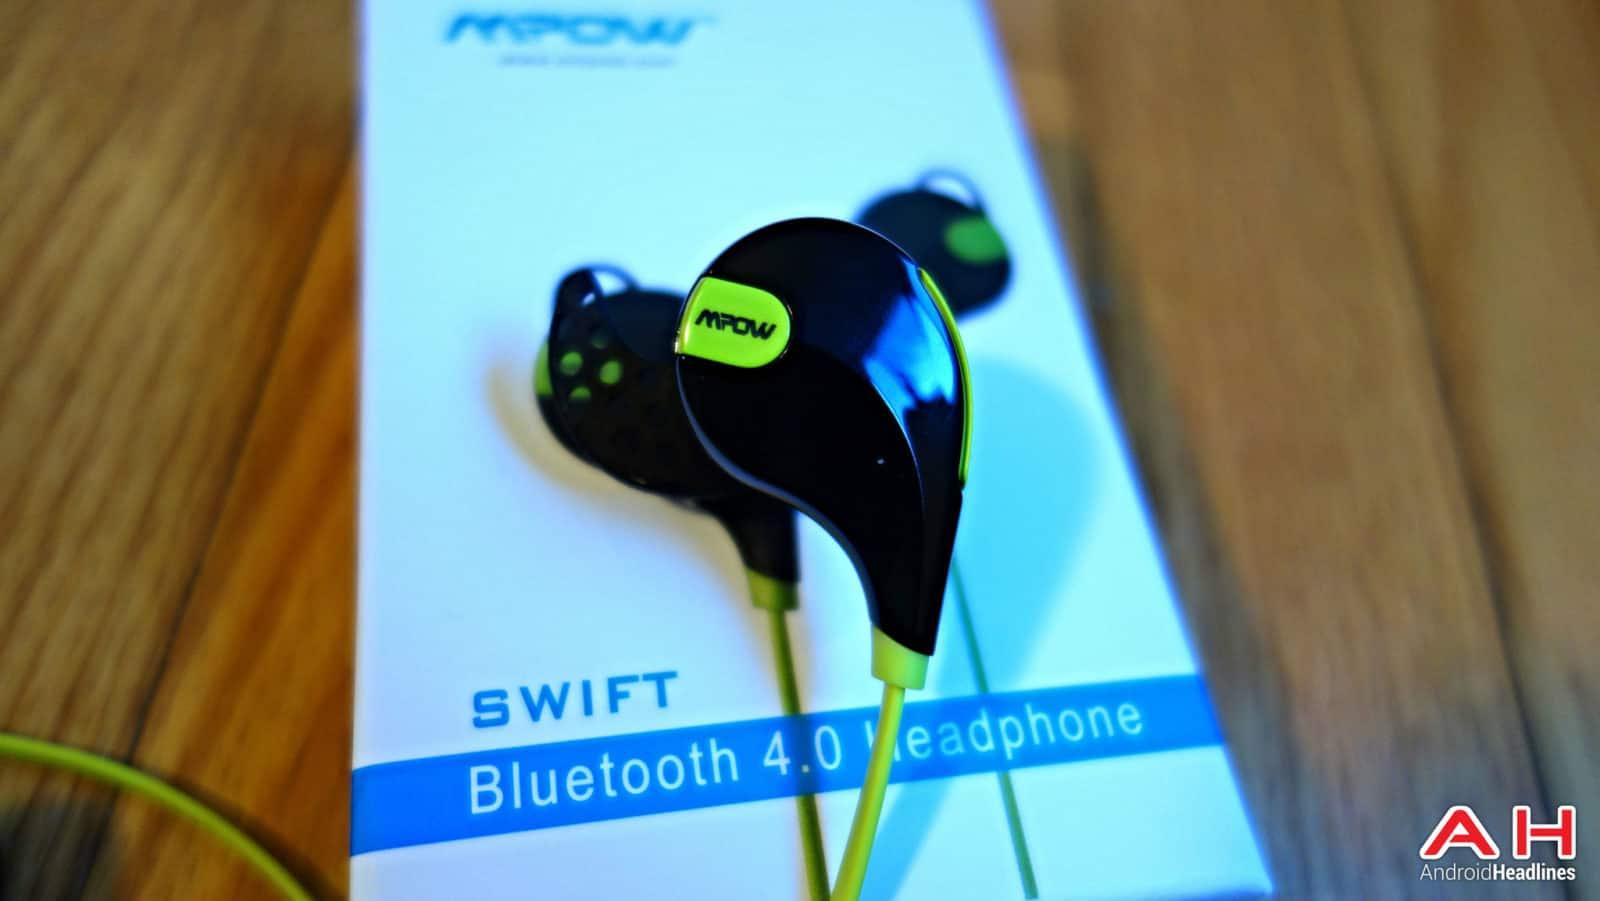 mpow swift bluetooth headphones7